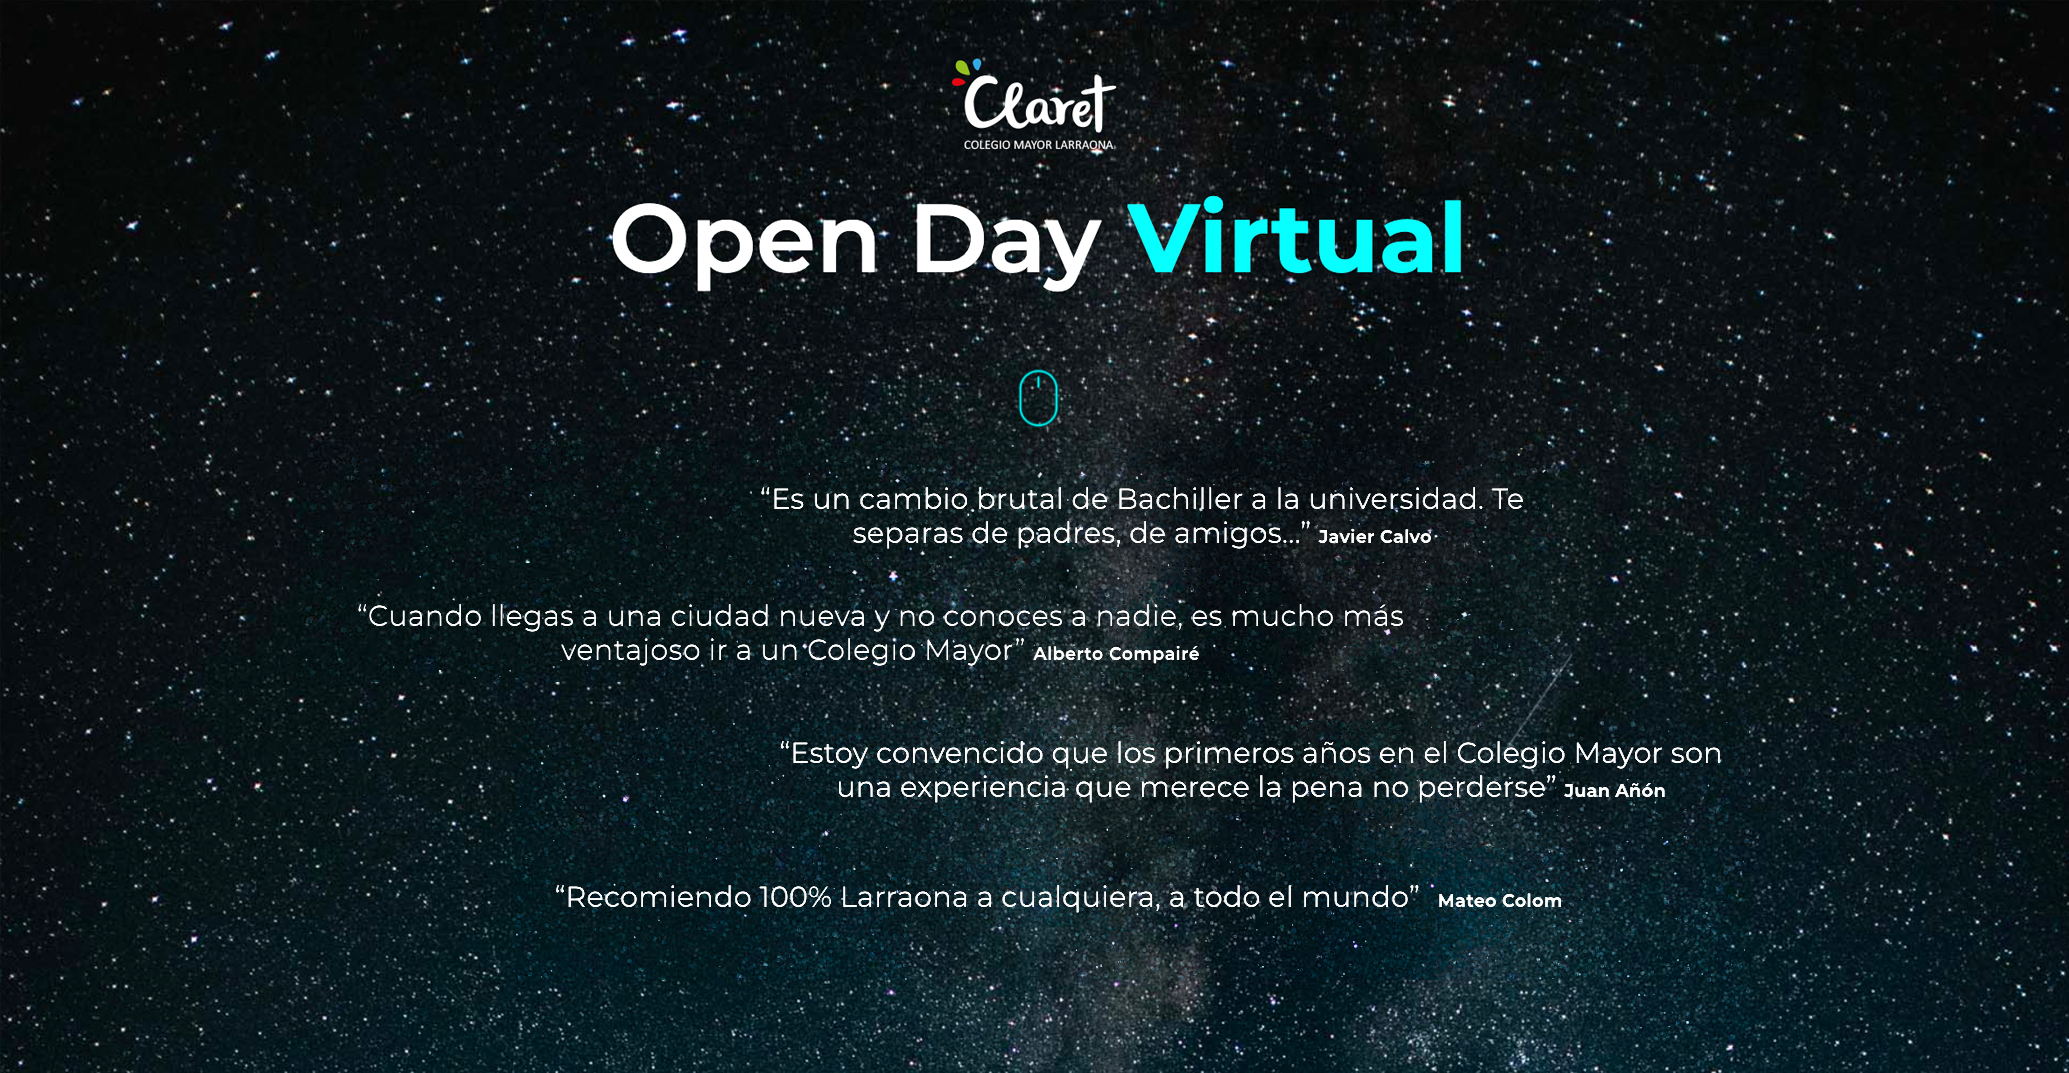 Diseño Open Day Virtual